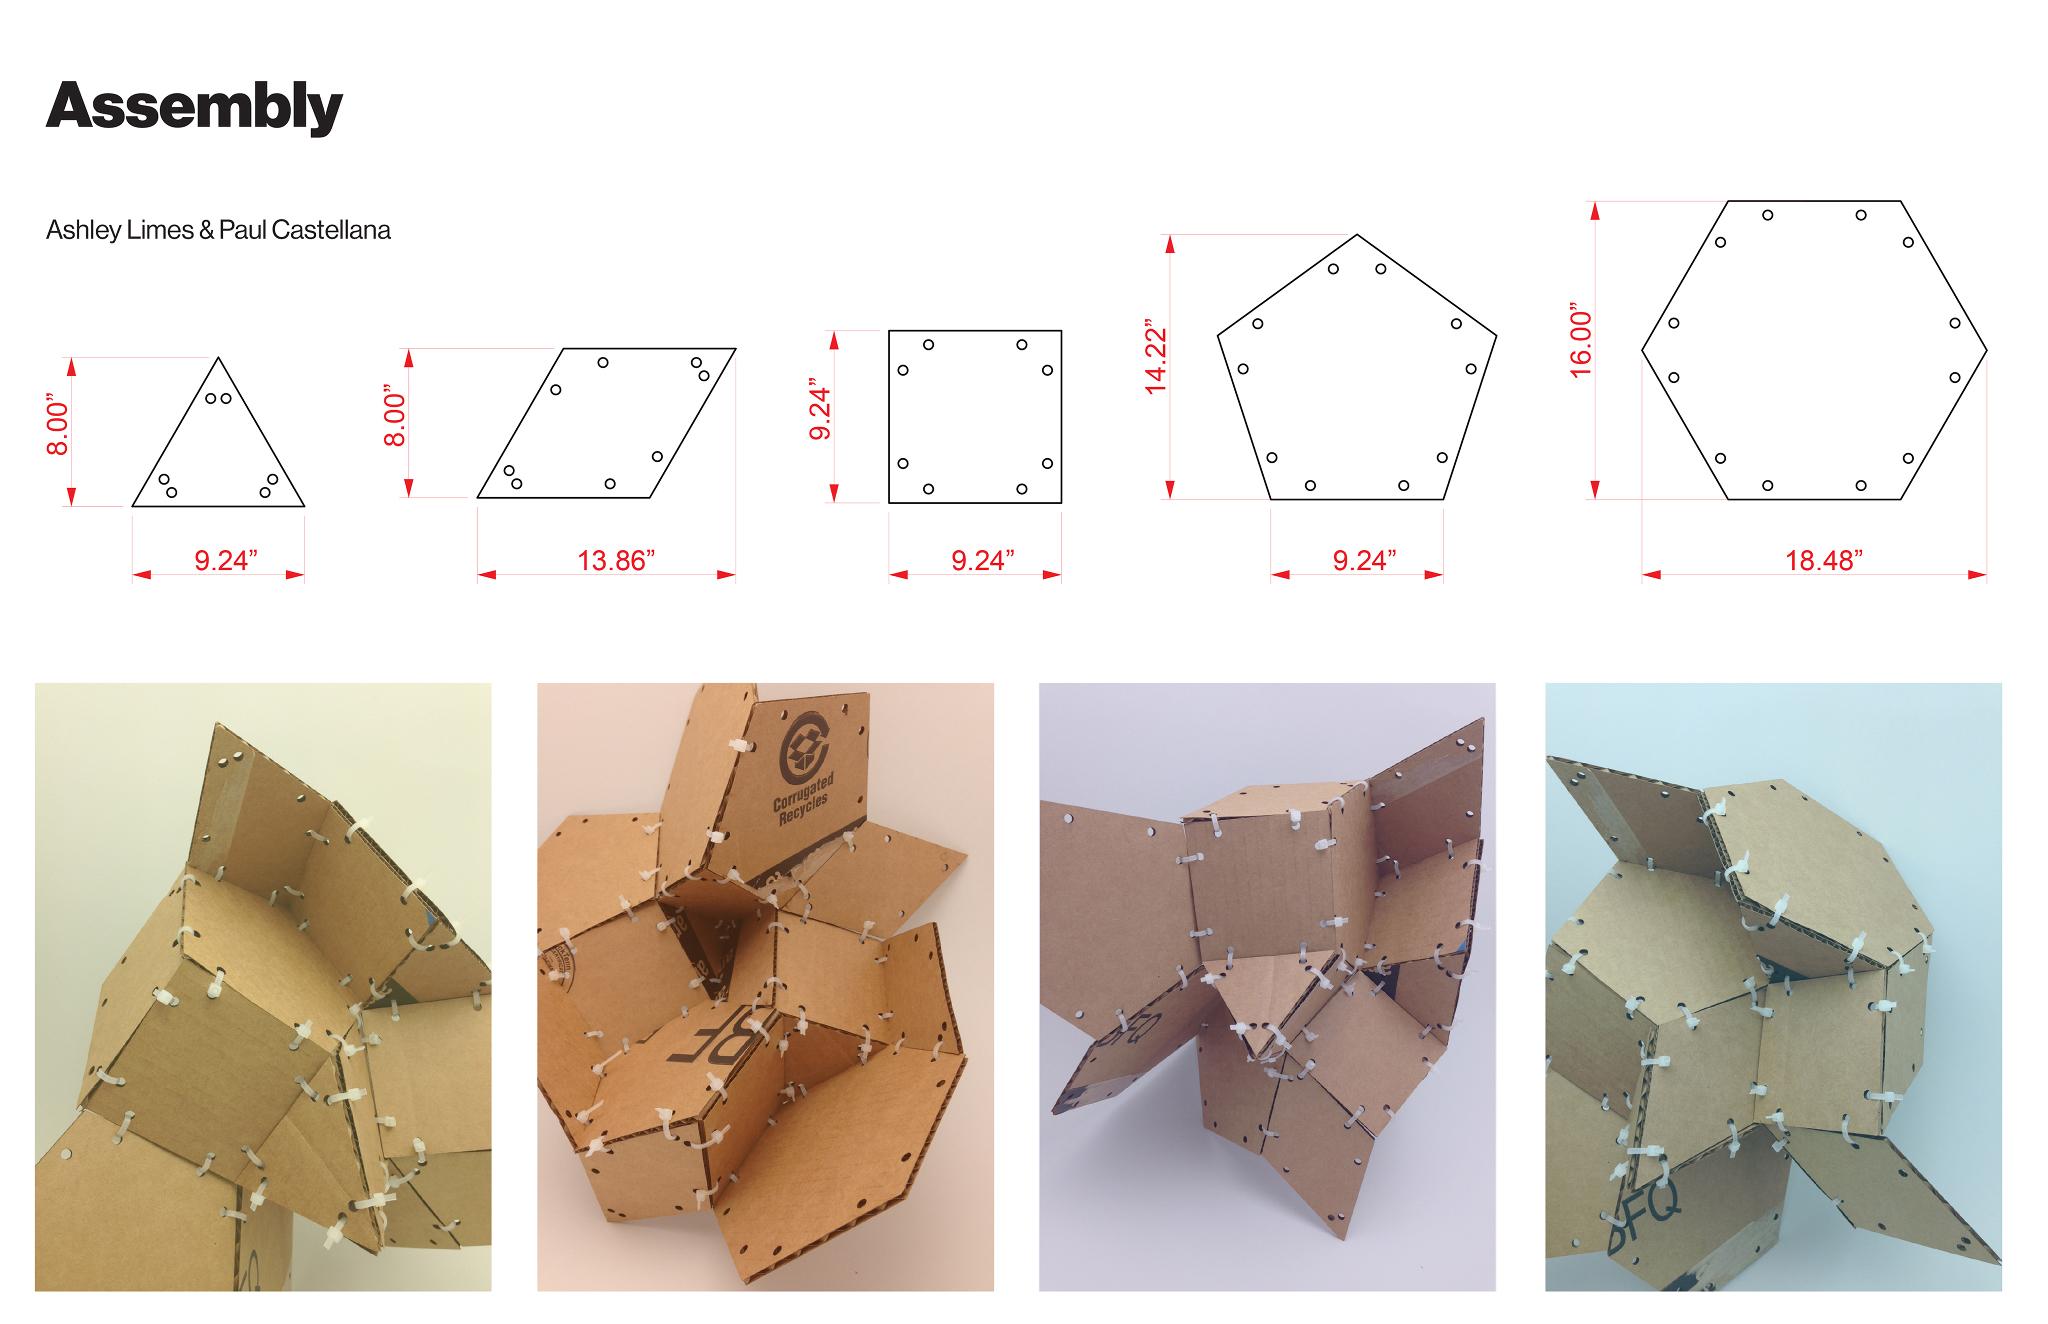 assembly_diagram_o.jpg